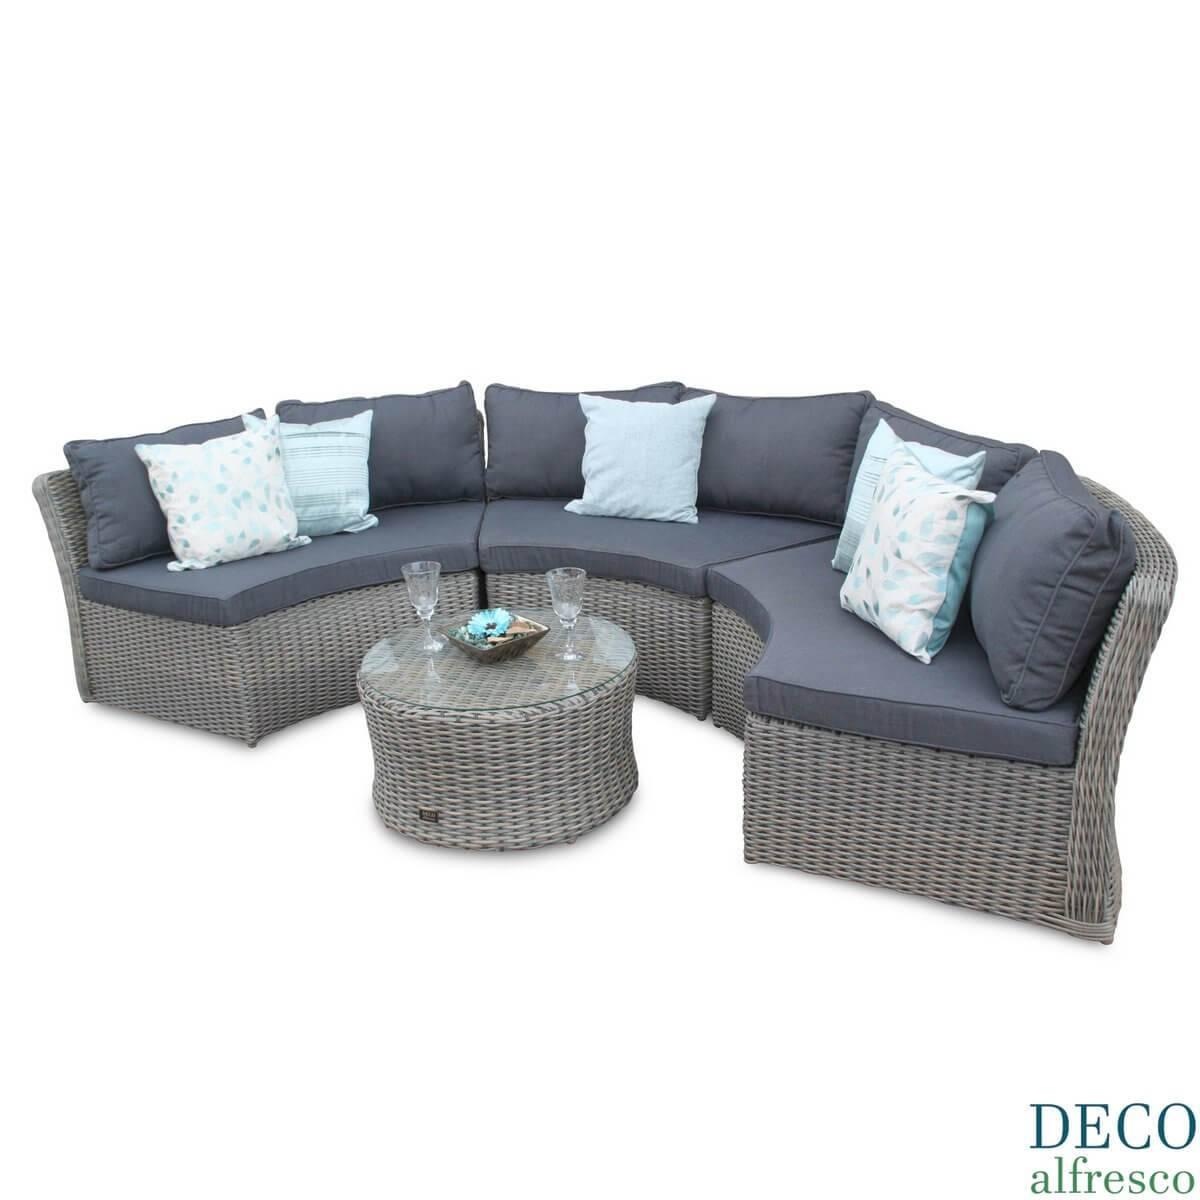 Half Moon Round Rattan Outdoor Furniture Sofa Natural Deco Alfresco With  Regard To Half Moon Sofas